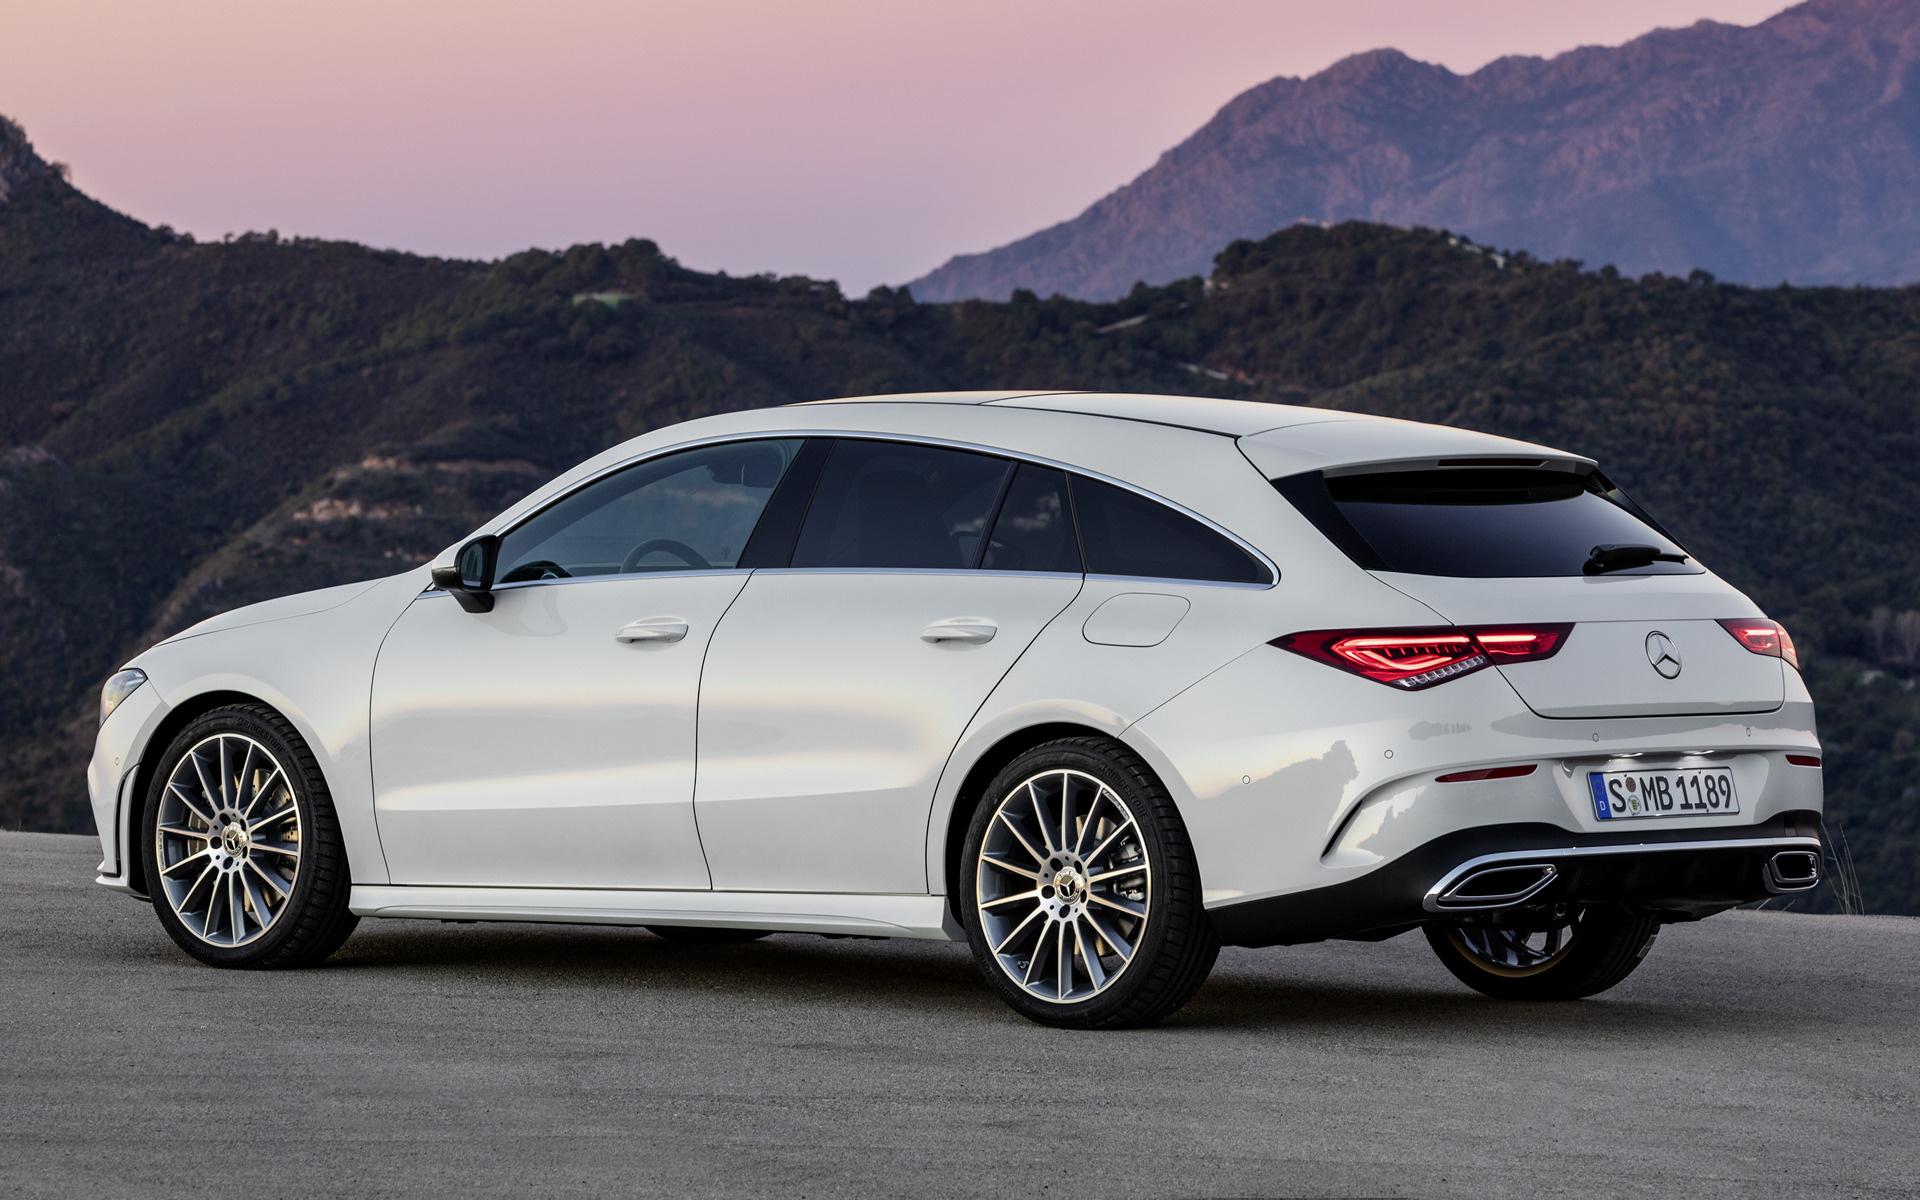 Mercedes Cla 45 Amg >> 2019 Mercedes-Benz CLA-Class Shooting Brake AMG Line ...